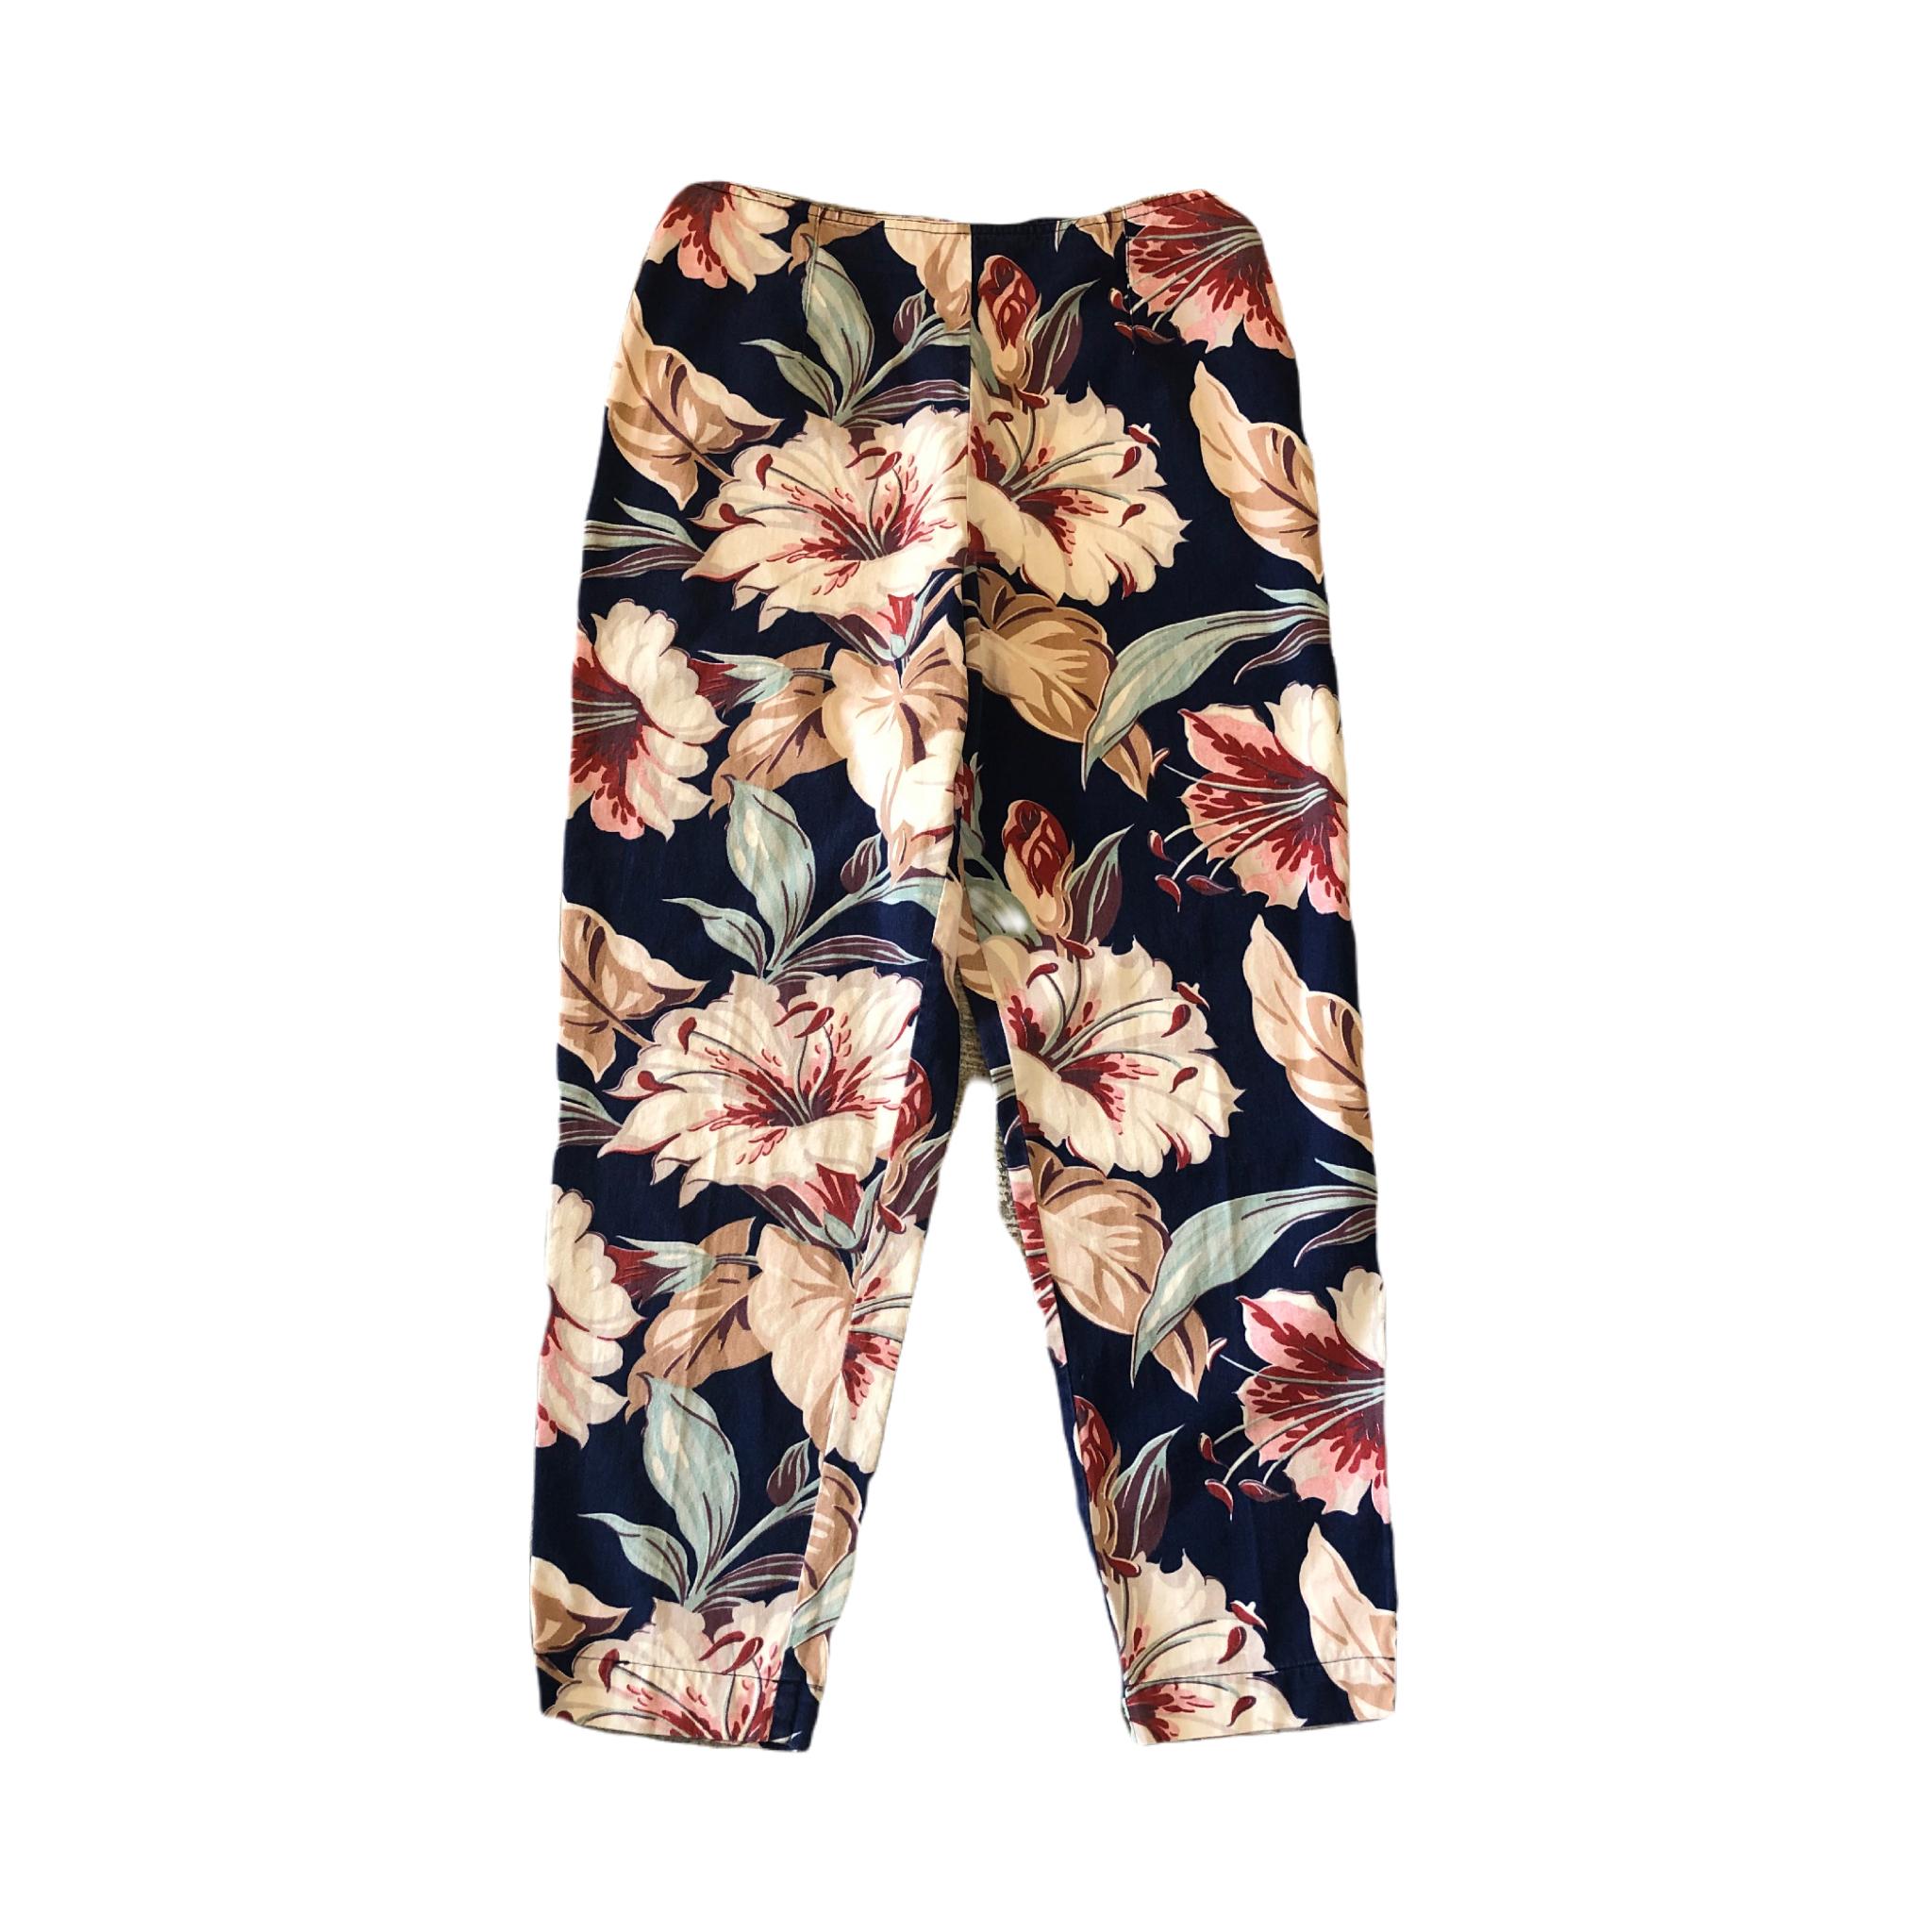 Ralph Lauren Polo Country Flower Pants ¥8,900+tax